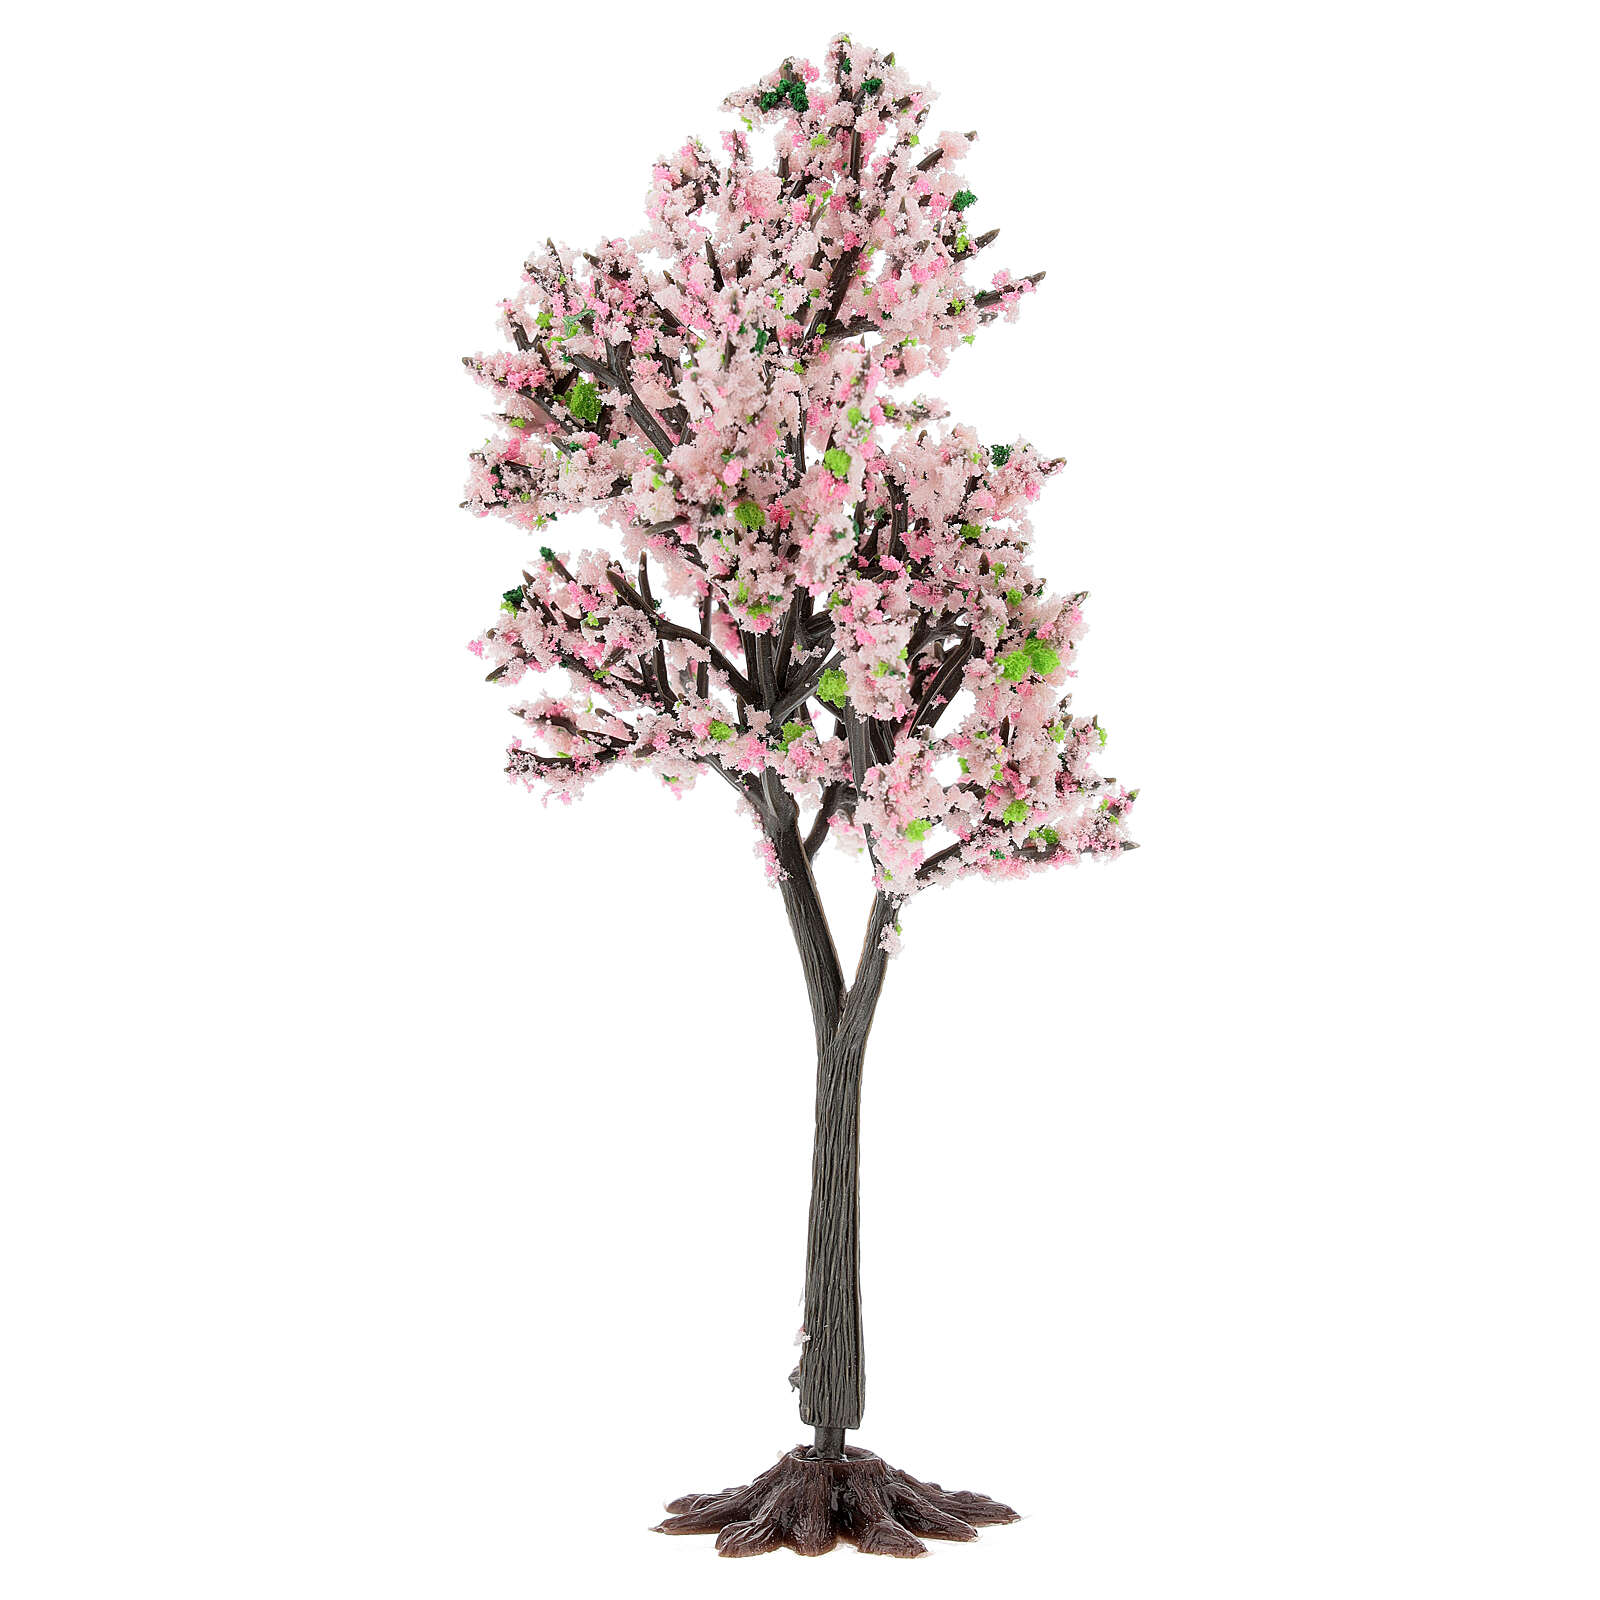 Cherry tree 15 cm for Nativity Scene with 6-10 cm figurines 4